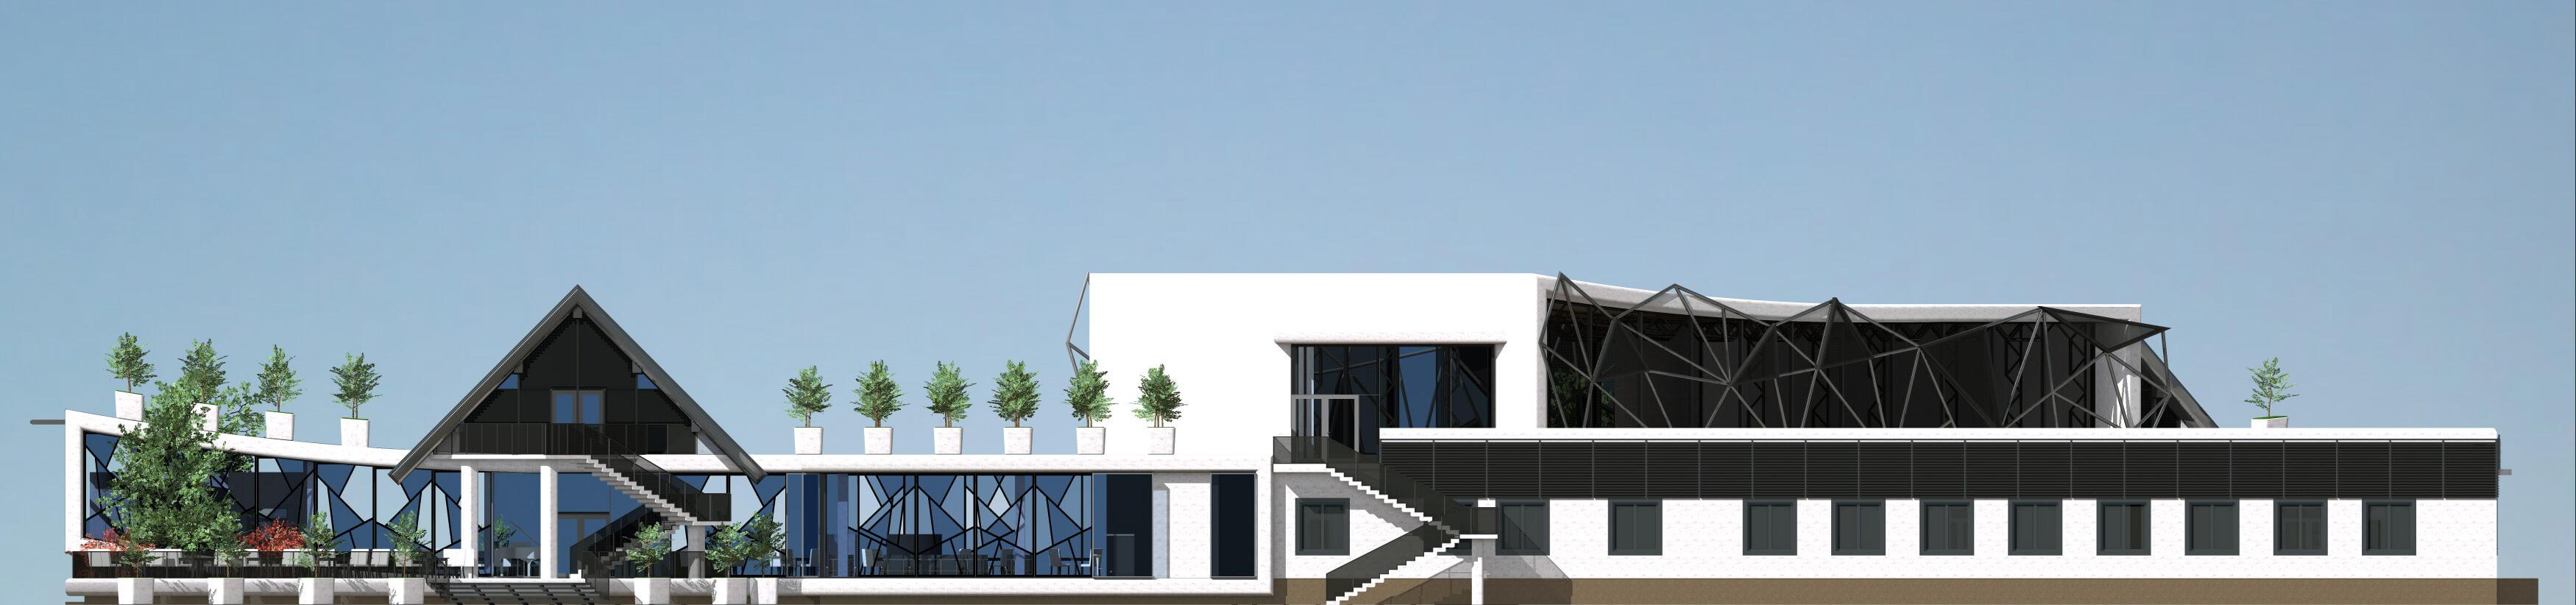 Каскад-Будинвест: проекты компании (изображение 33)